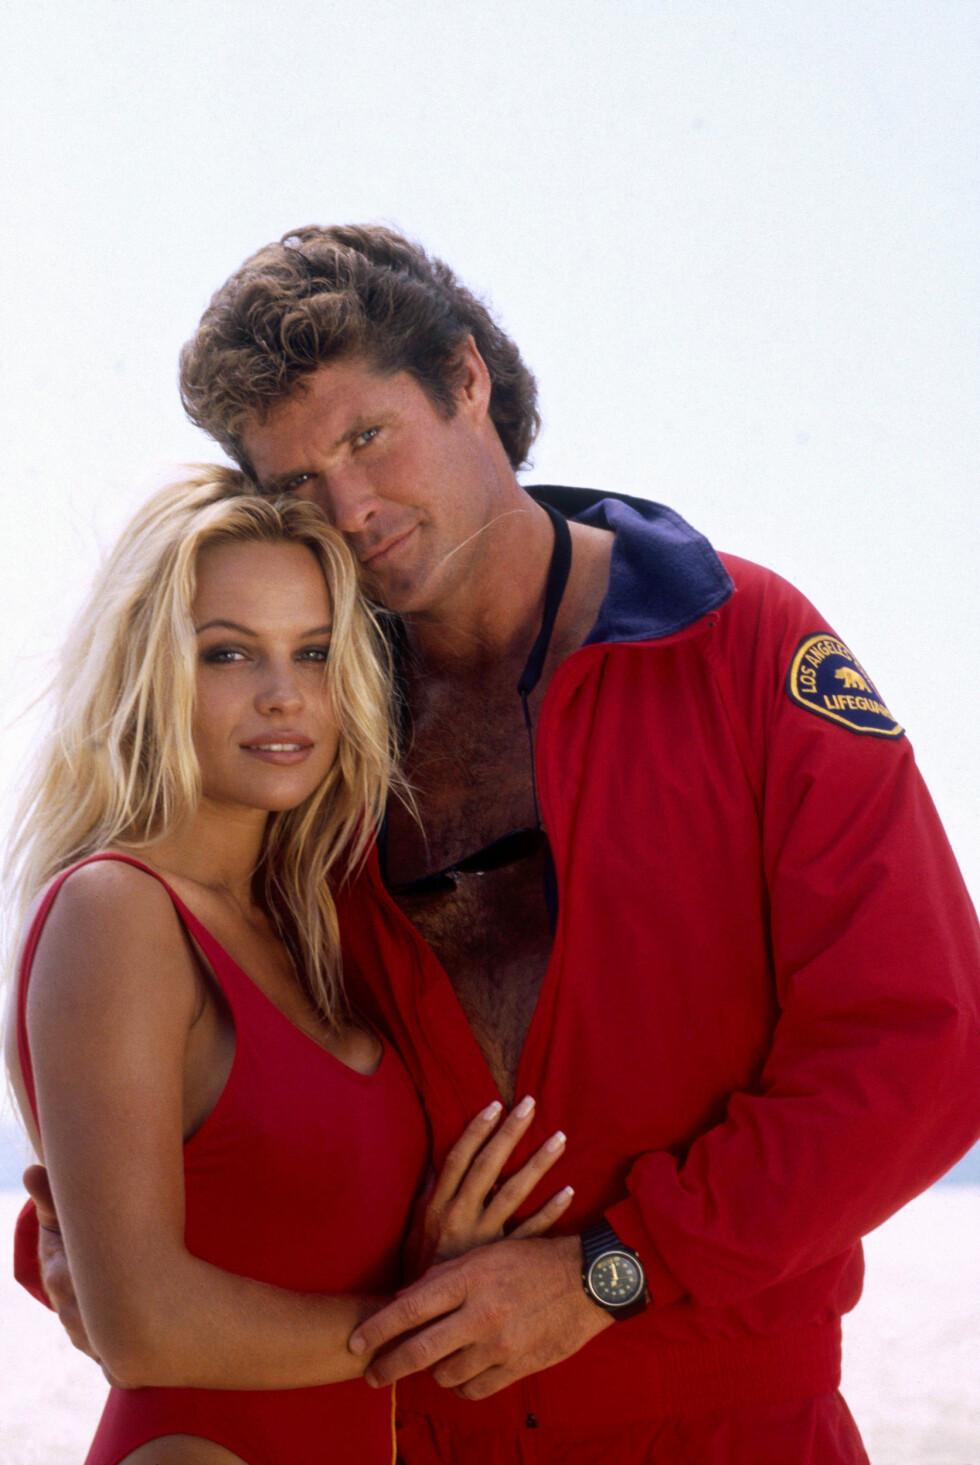 PUPPEFOKUS: David Hasselhoff ville egentlig ikke at Pamela Anderson, den tidligere Playboy-modellen, skulle spille i serien. I 1992 fikk hun allikevel rollen som livvakt C.J. Parker. Foto: NTB Scanpix